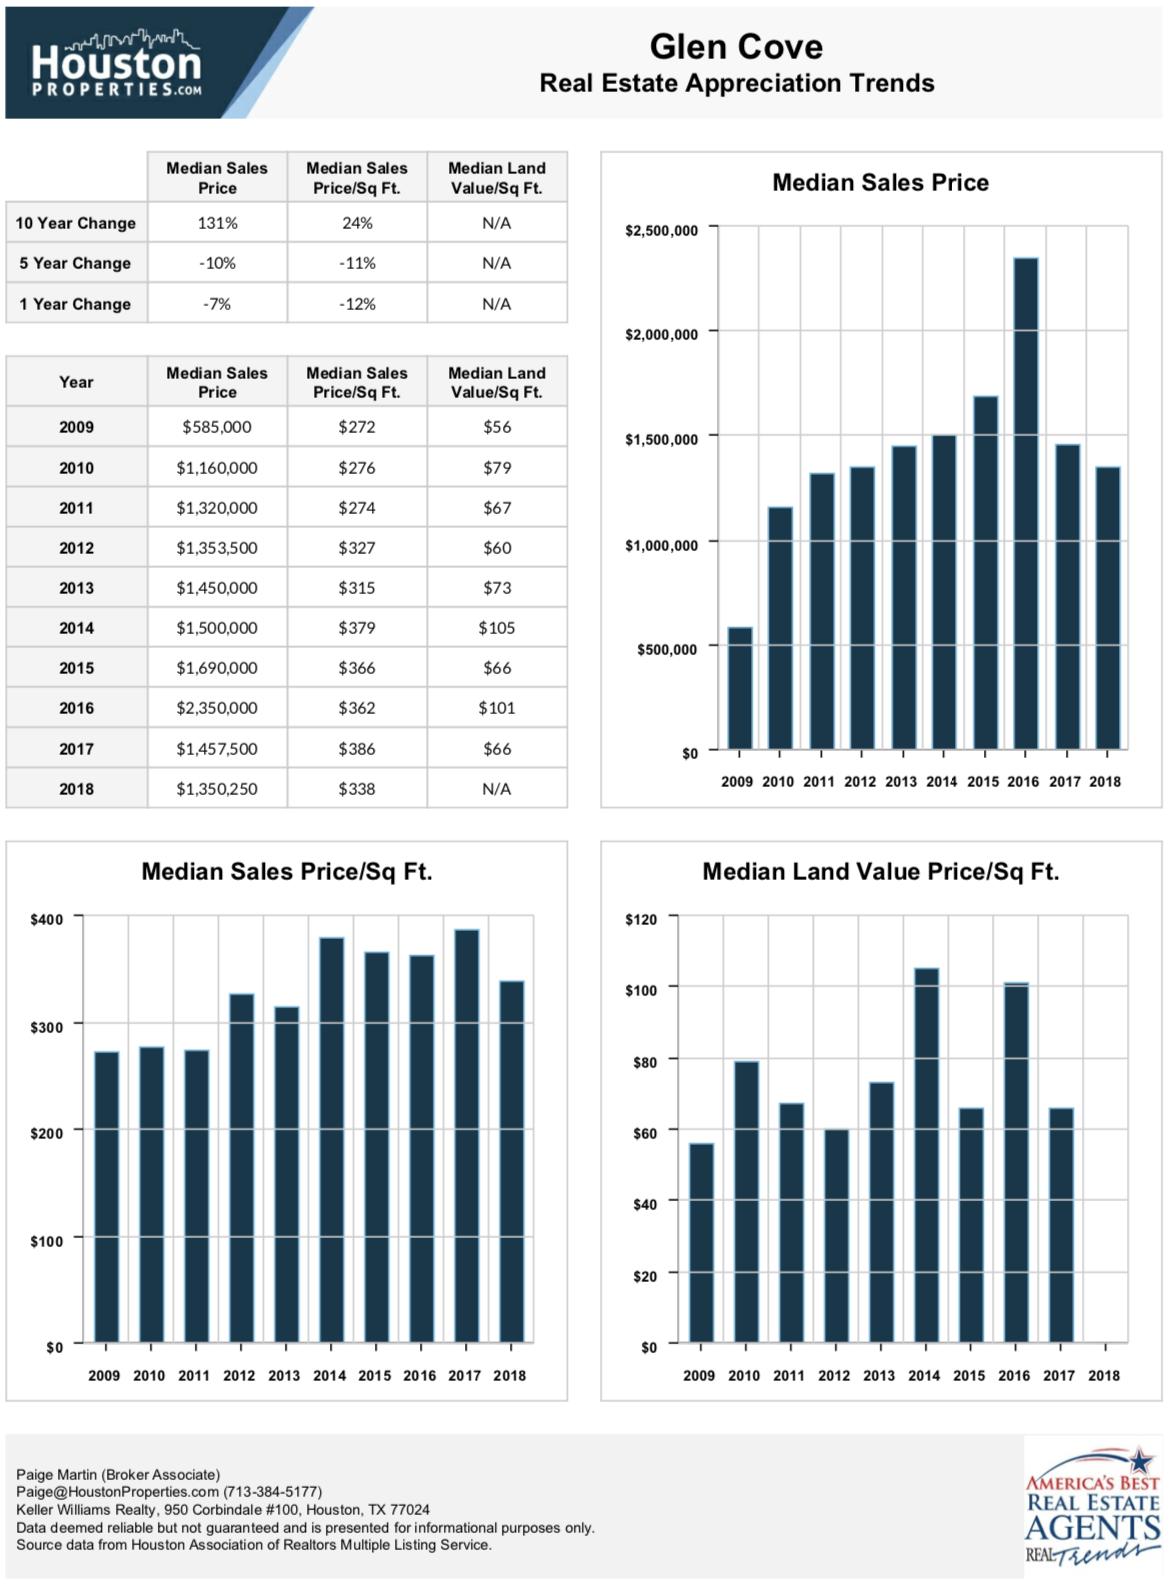 Glen Cove 10 Year Real Estate Appreciation Rates